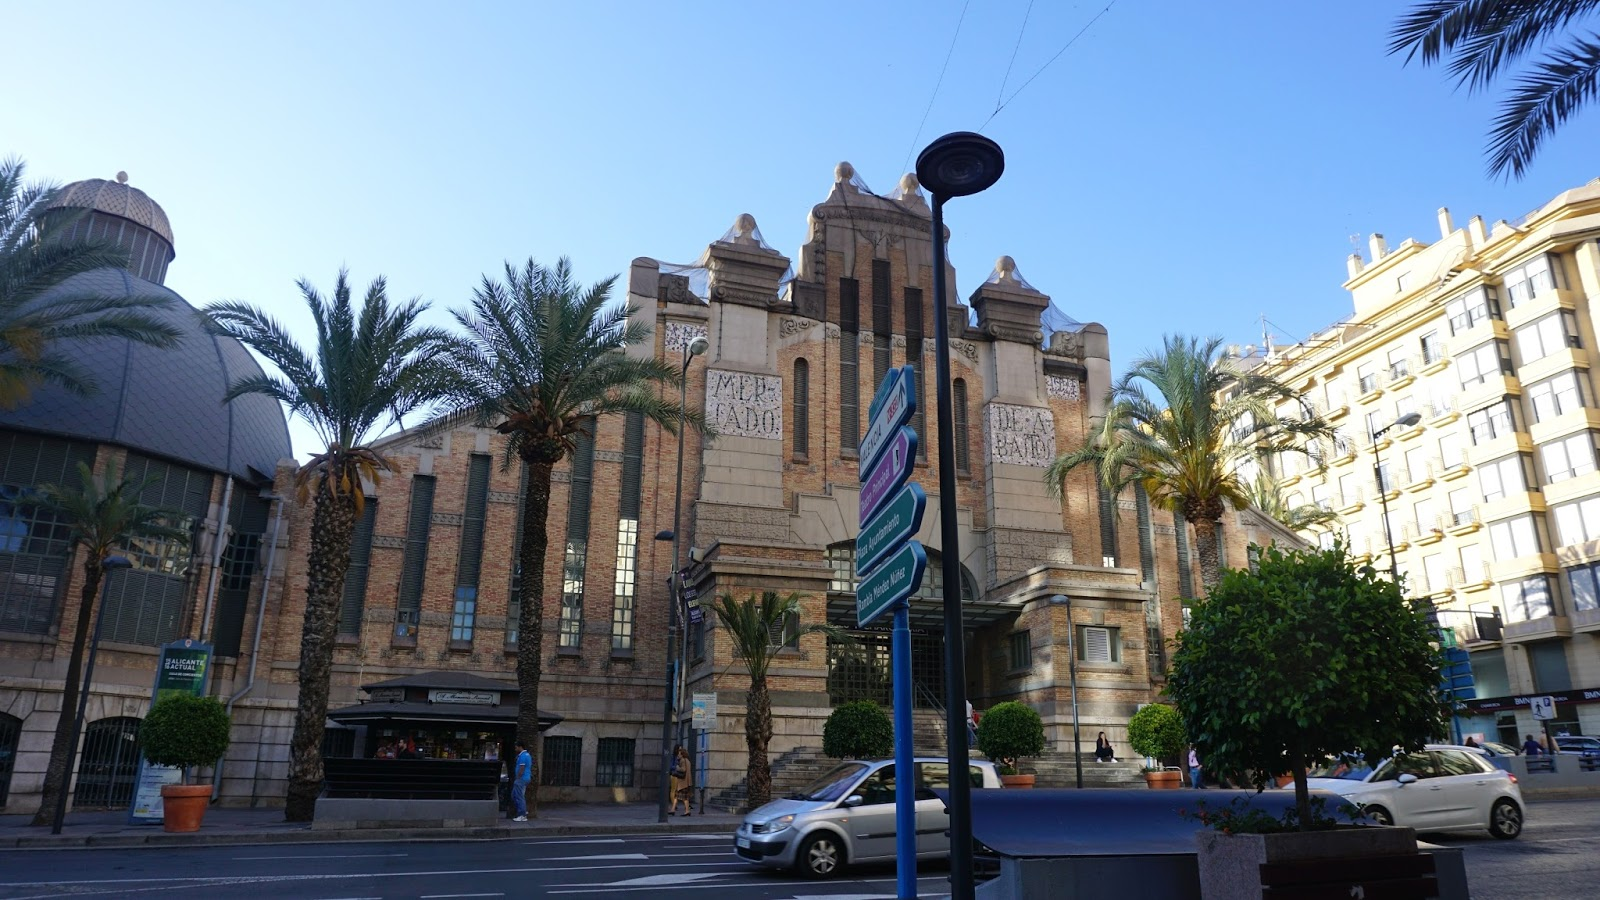 Alicante, atrakcje Hiszpanii, południowa Hiszpania, Pani Dorcia, Pani Dorcia blog, blog o podróżach